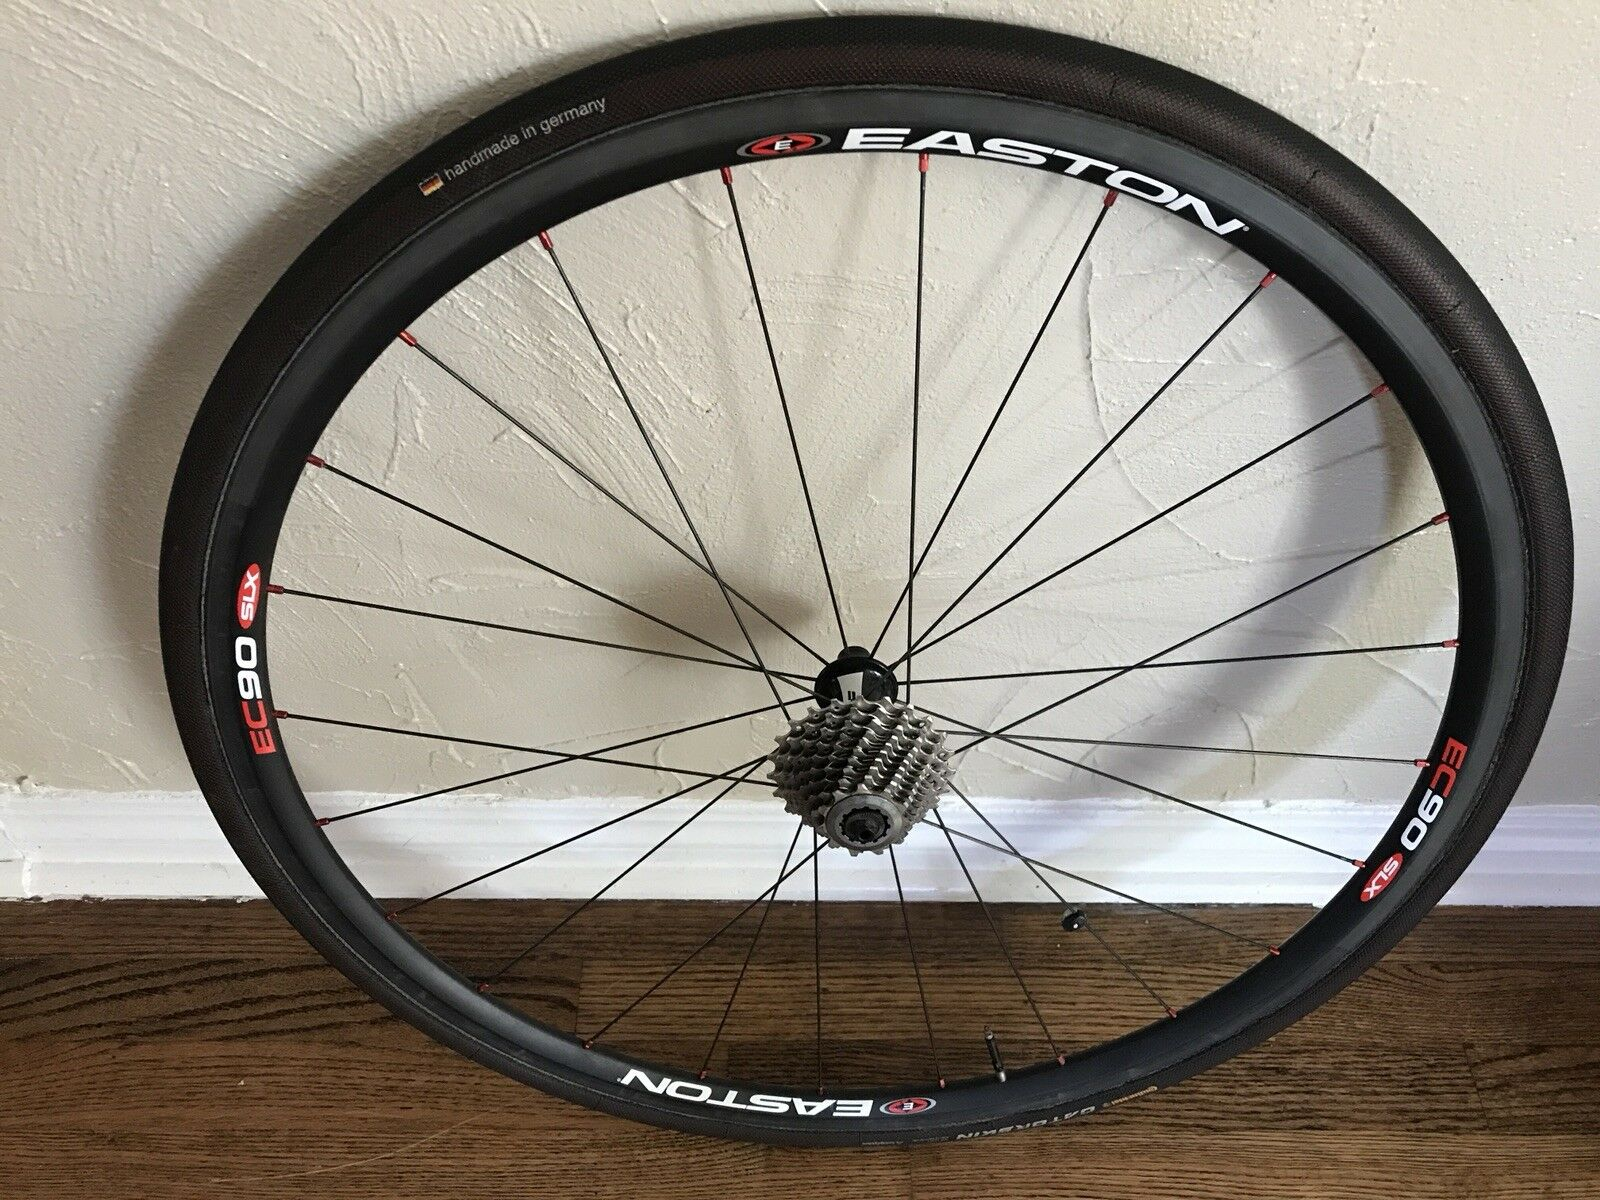 Easton EC90 SLX Carbon Bicycle Cycling Wheel